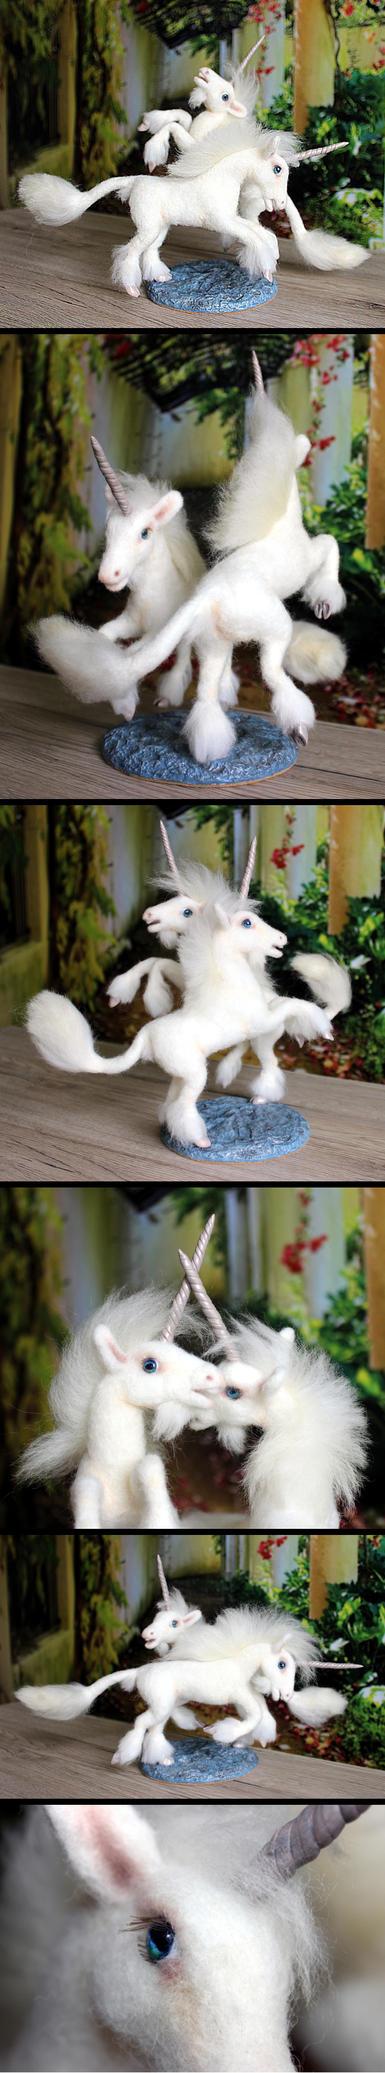 Two prancing Unicorns by Finya-Vardeen